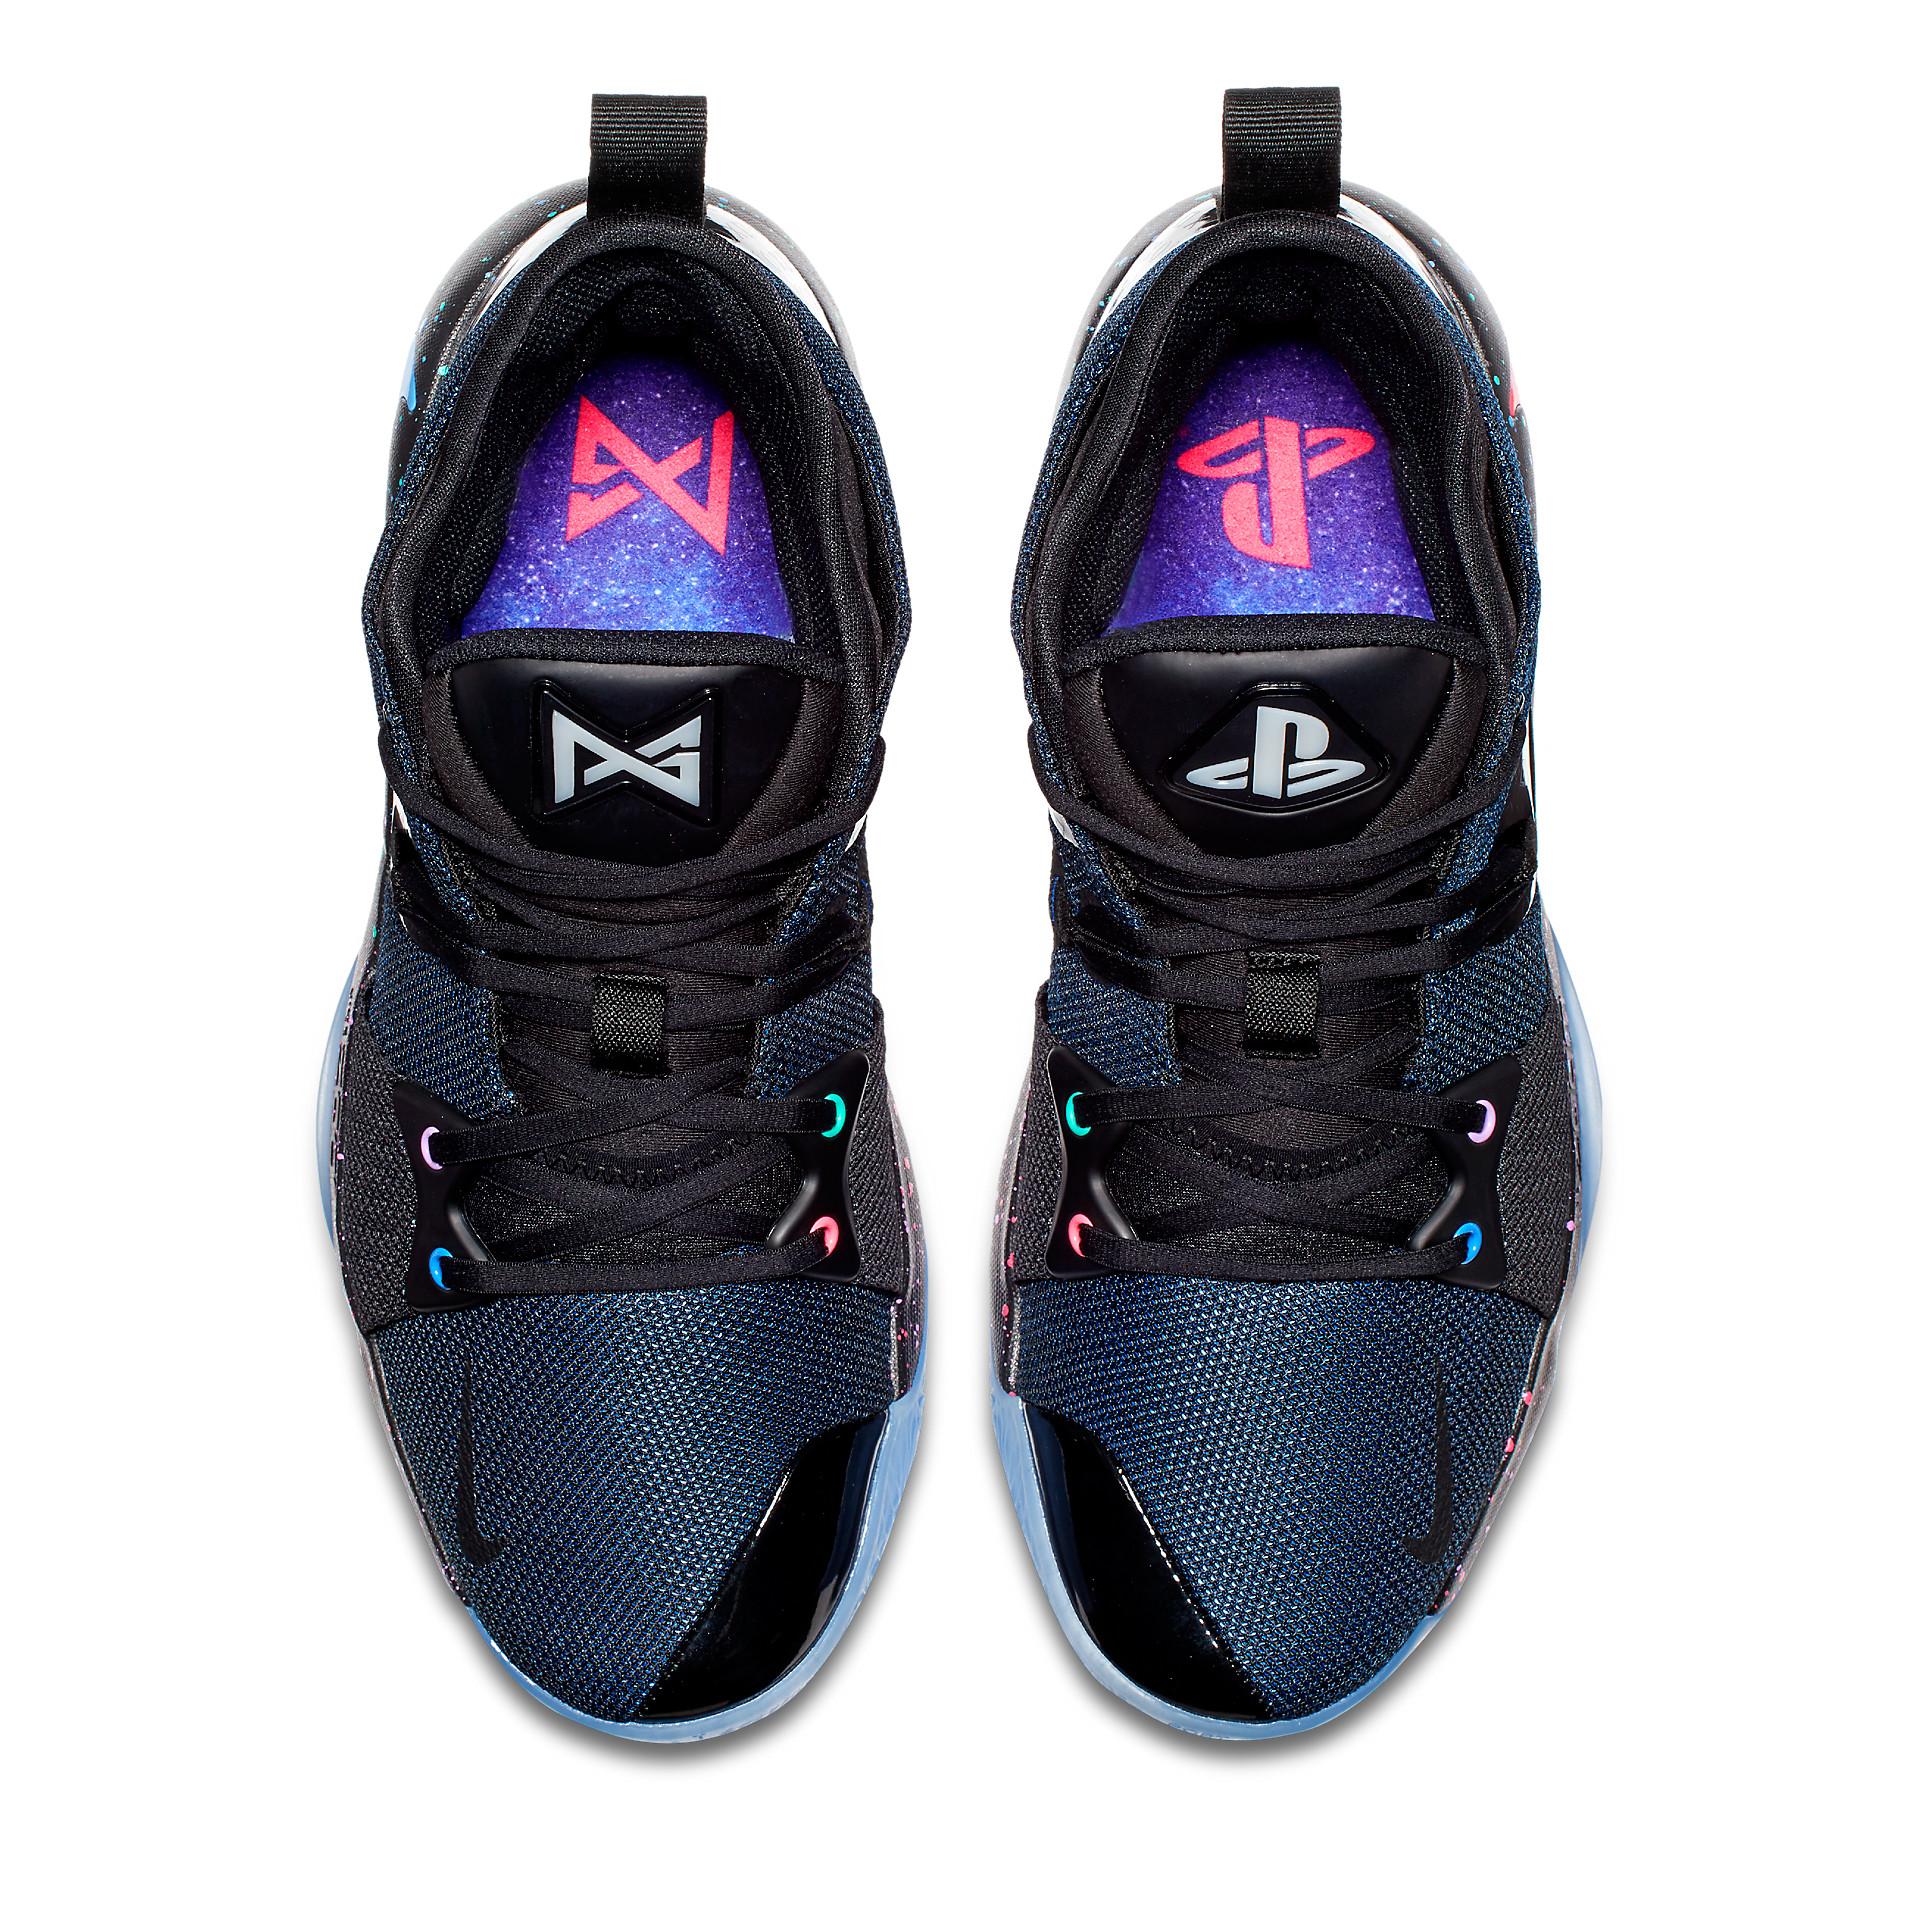 Pg 2 Playstation Colorway Edition Playstation